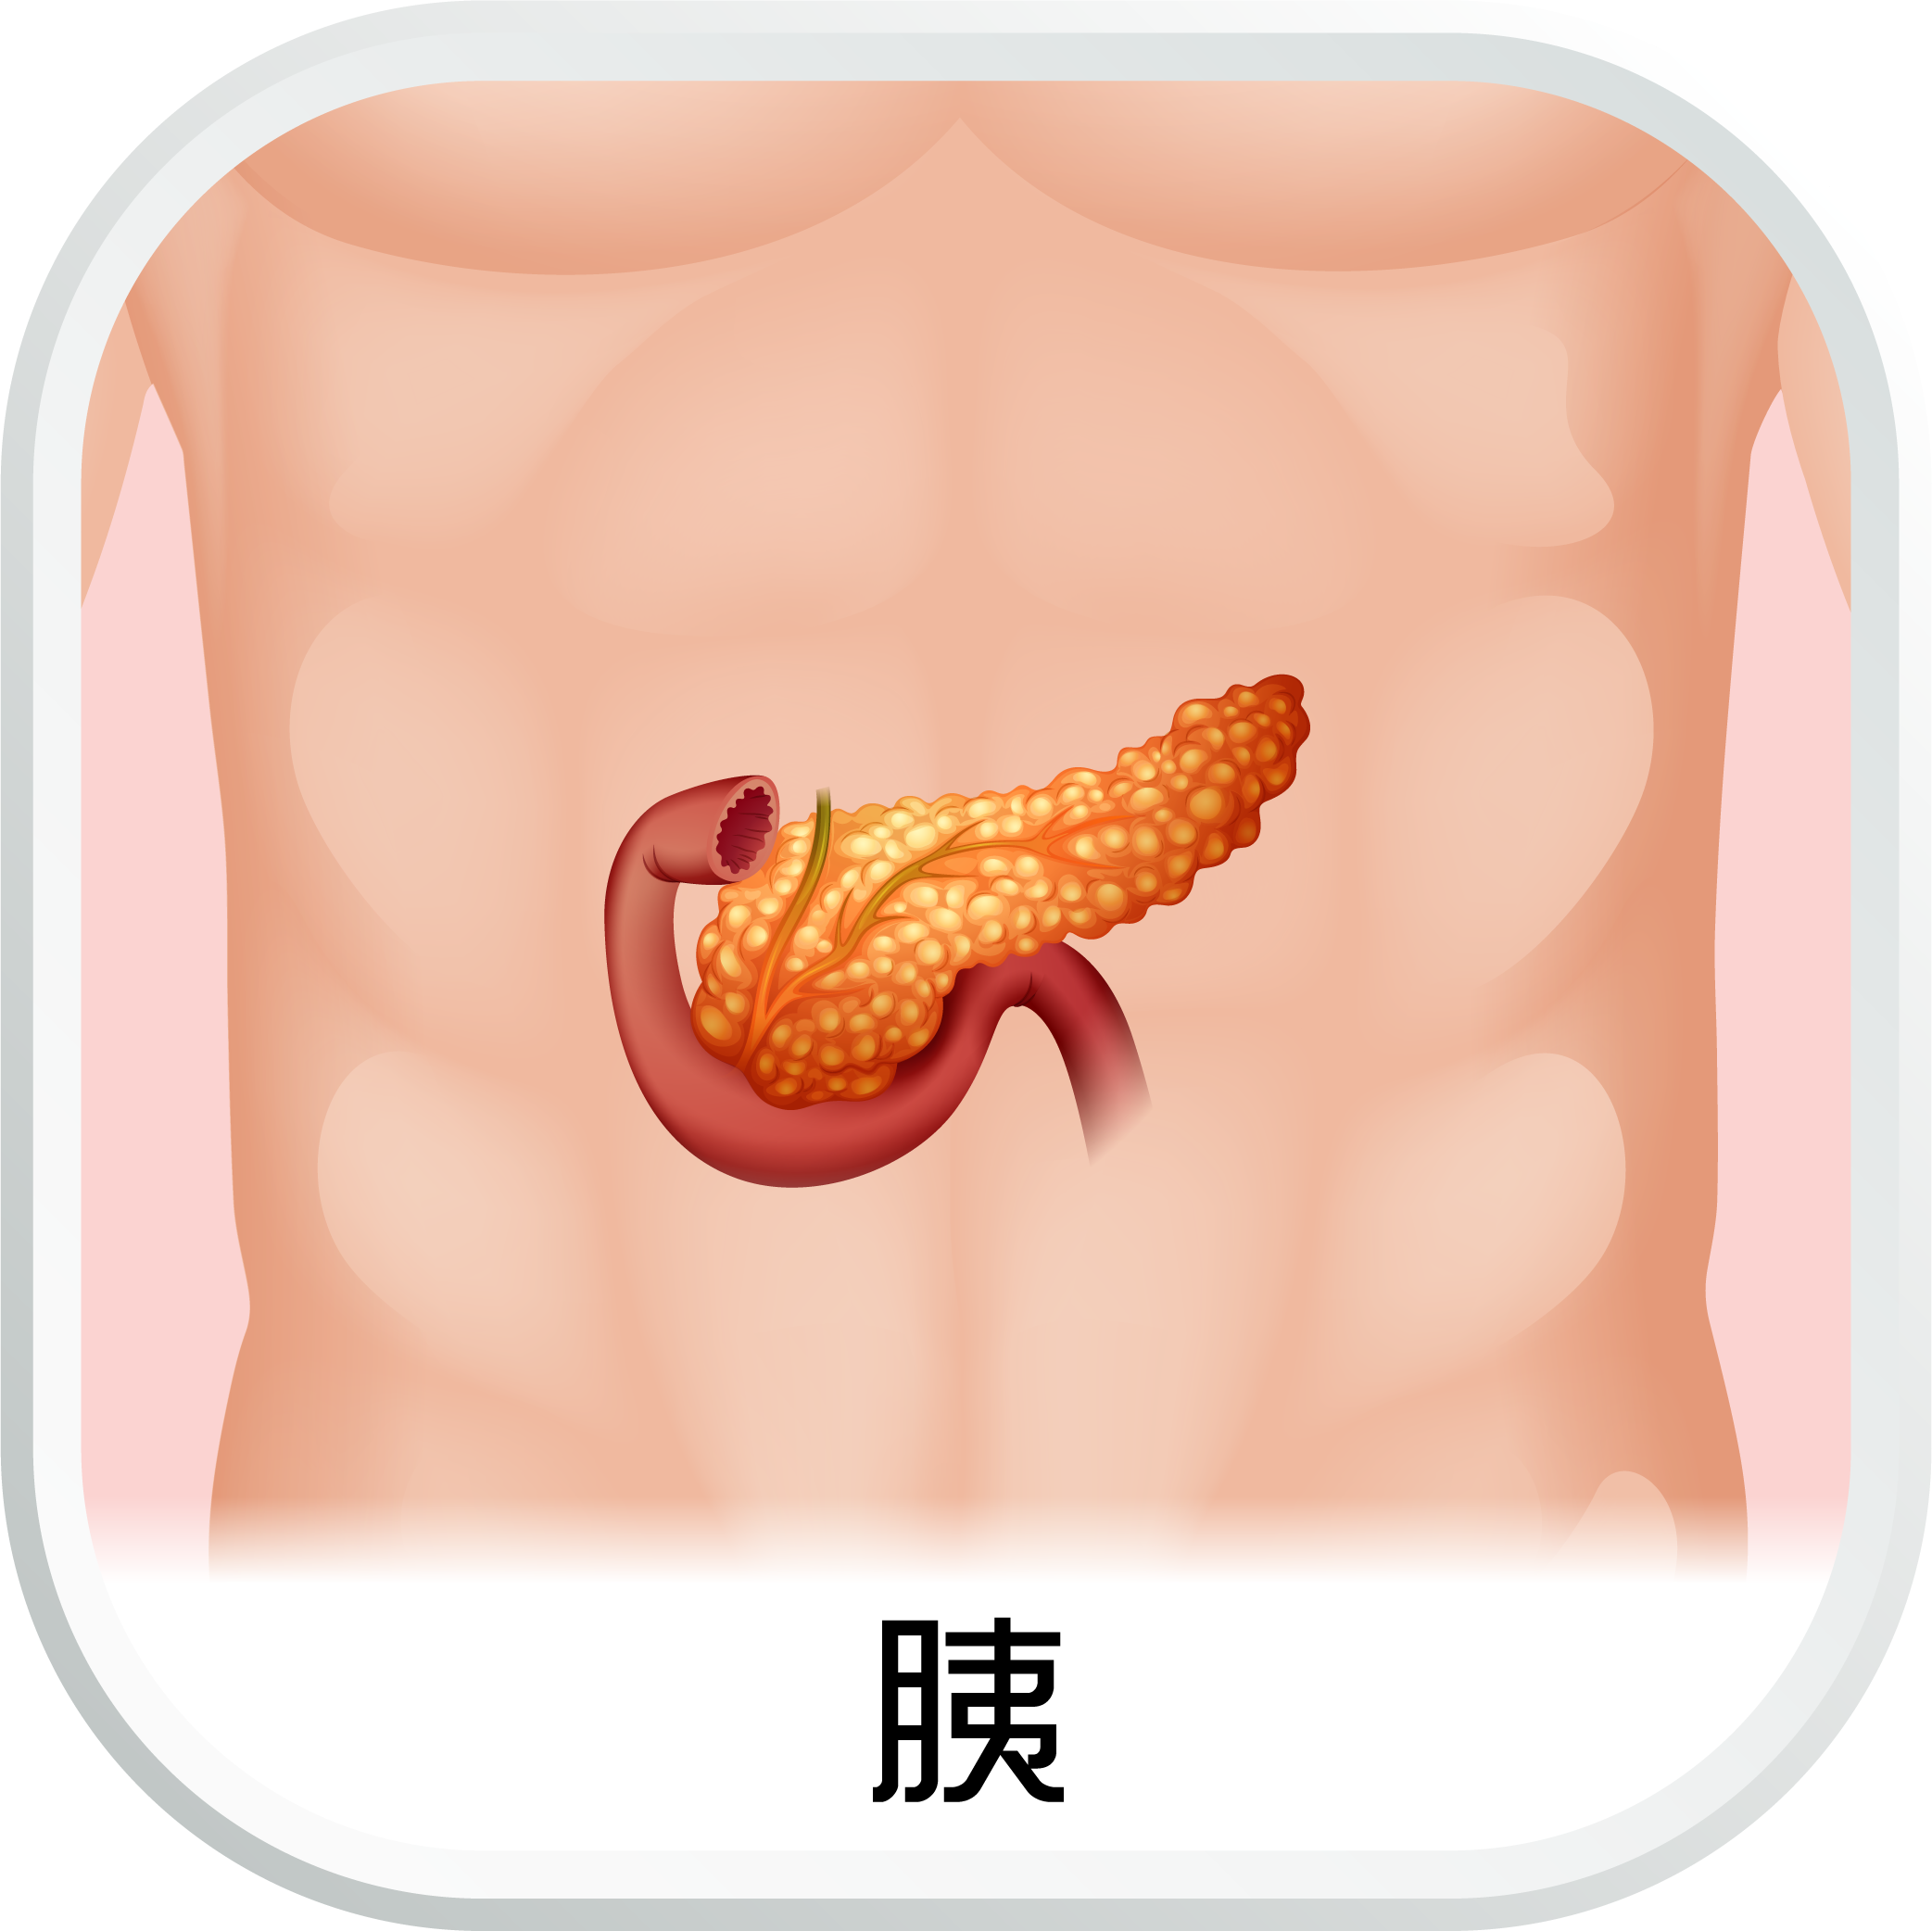 EHC_SubCat_aw_胰